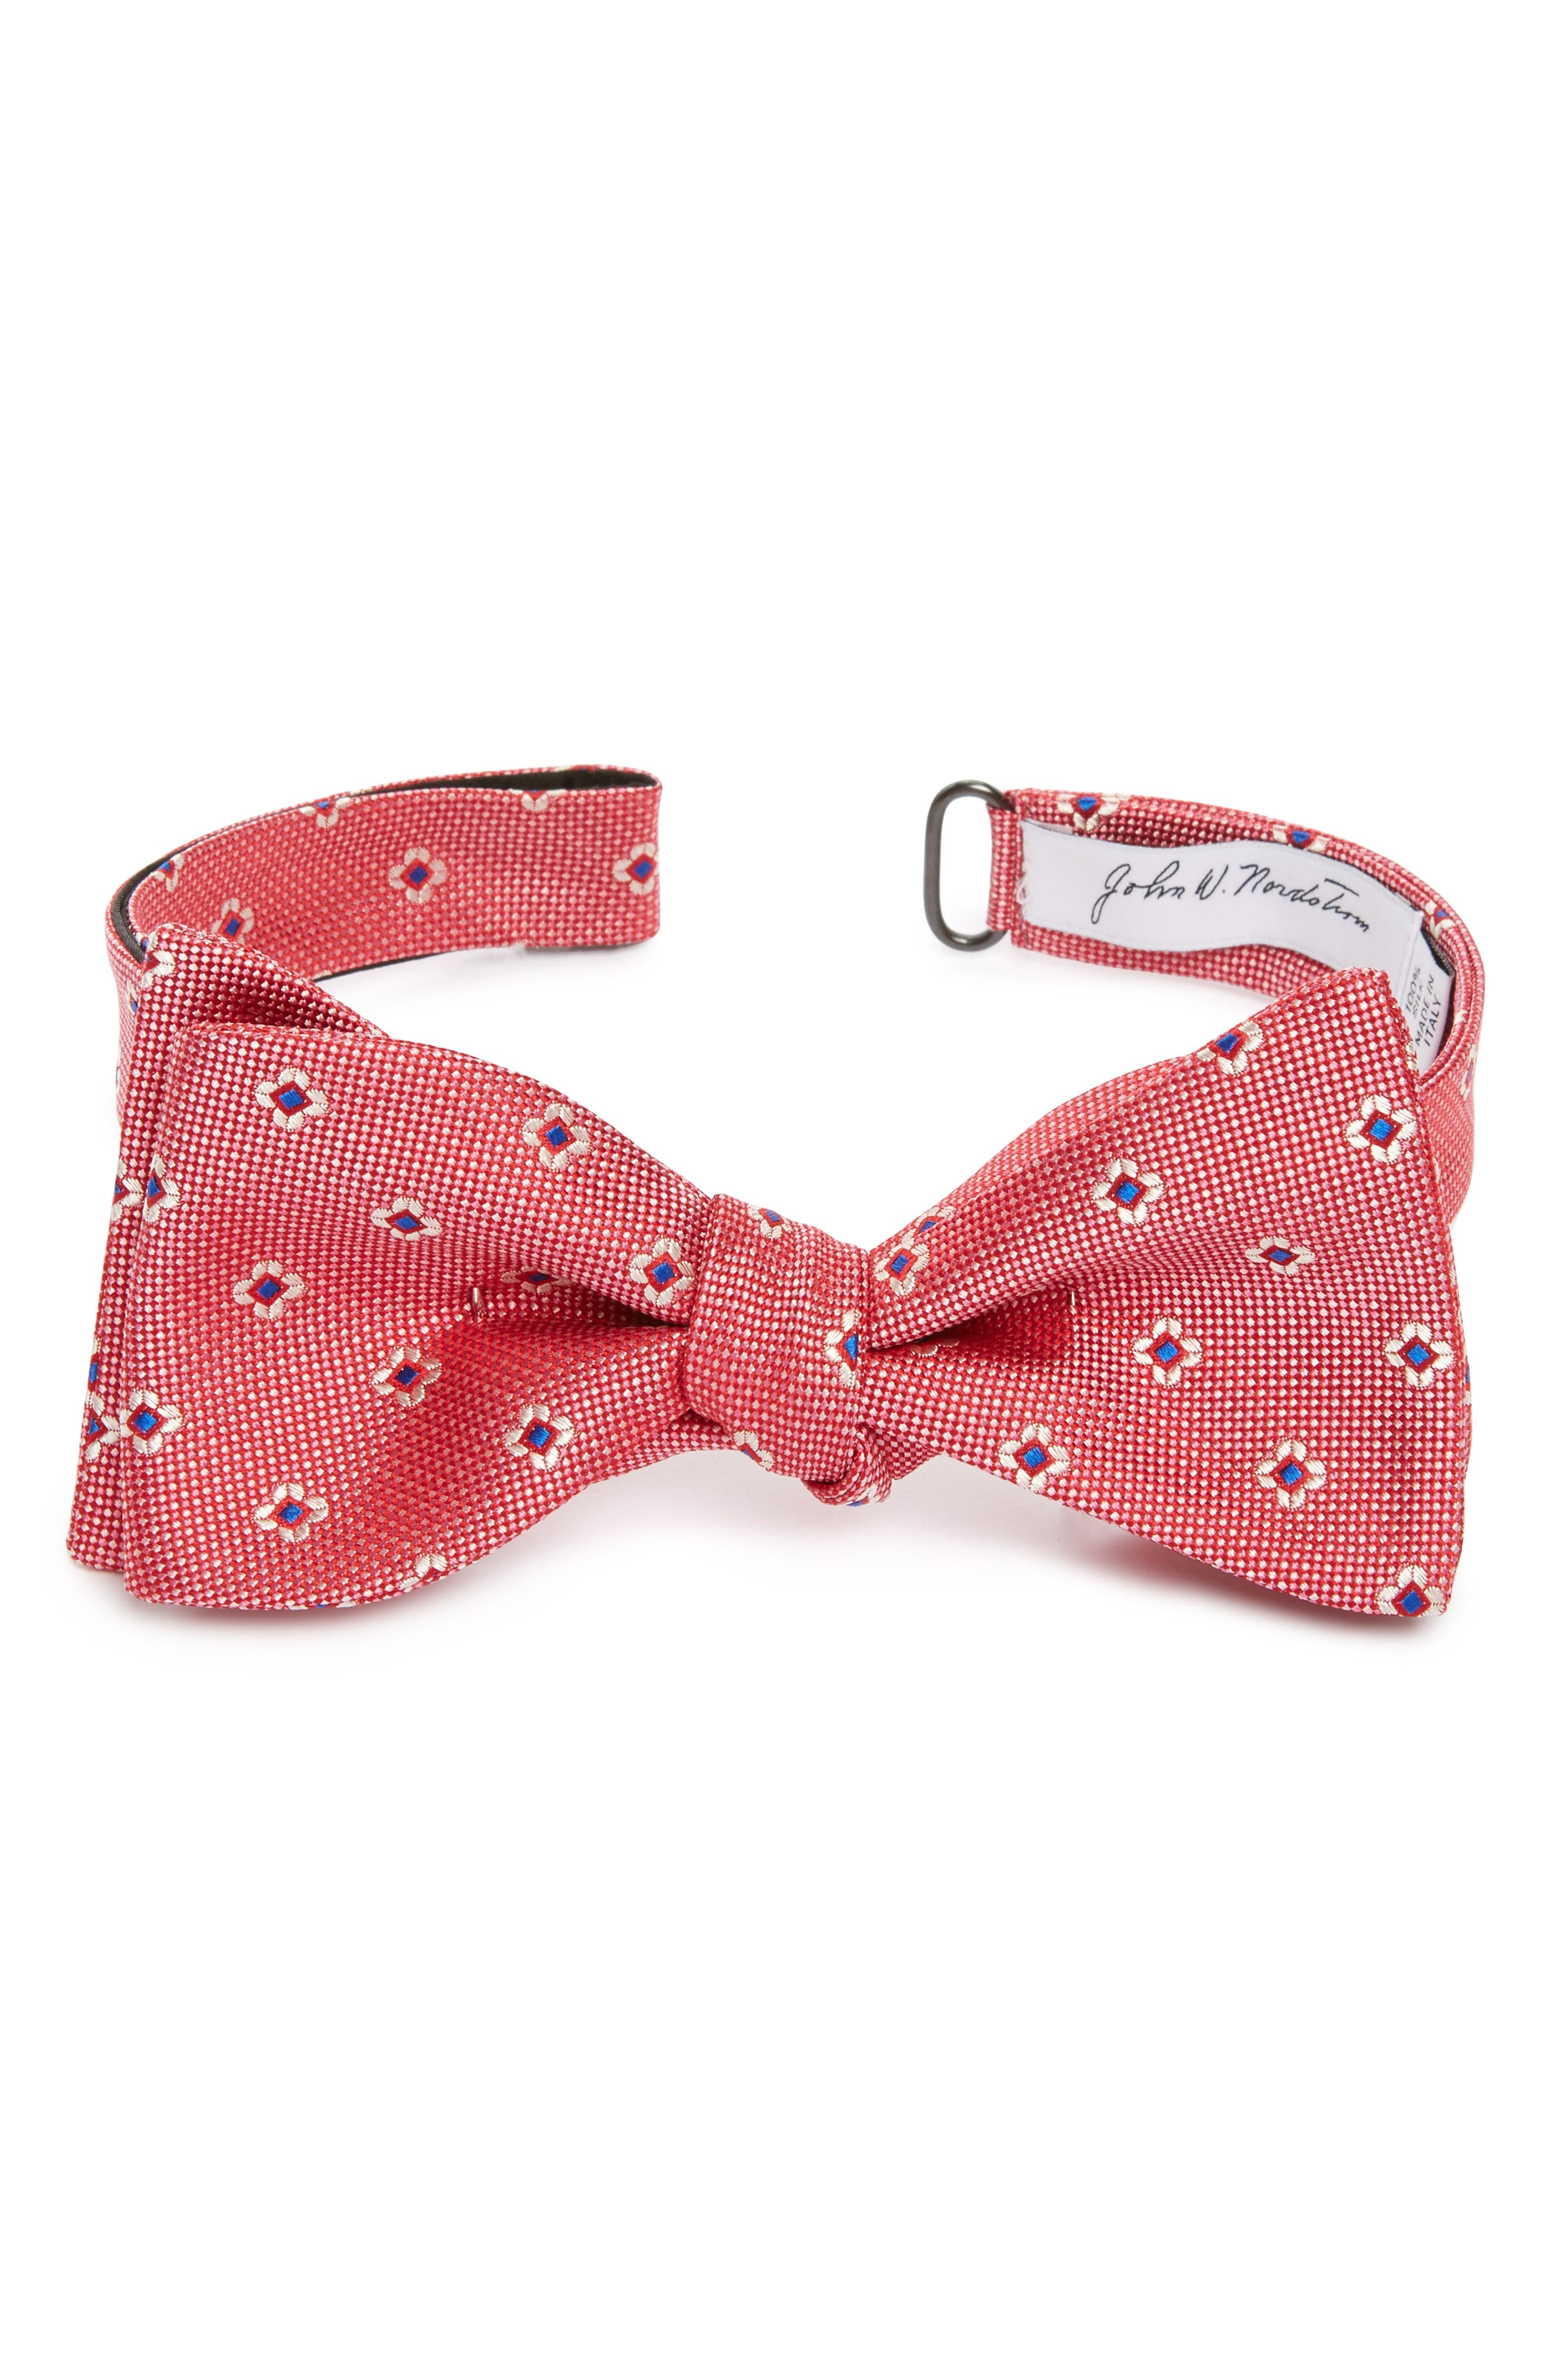 John W. Nordstrom® Floral Silk Bow Tie